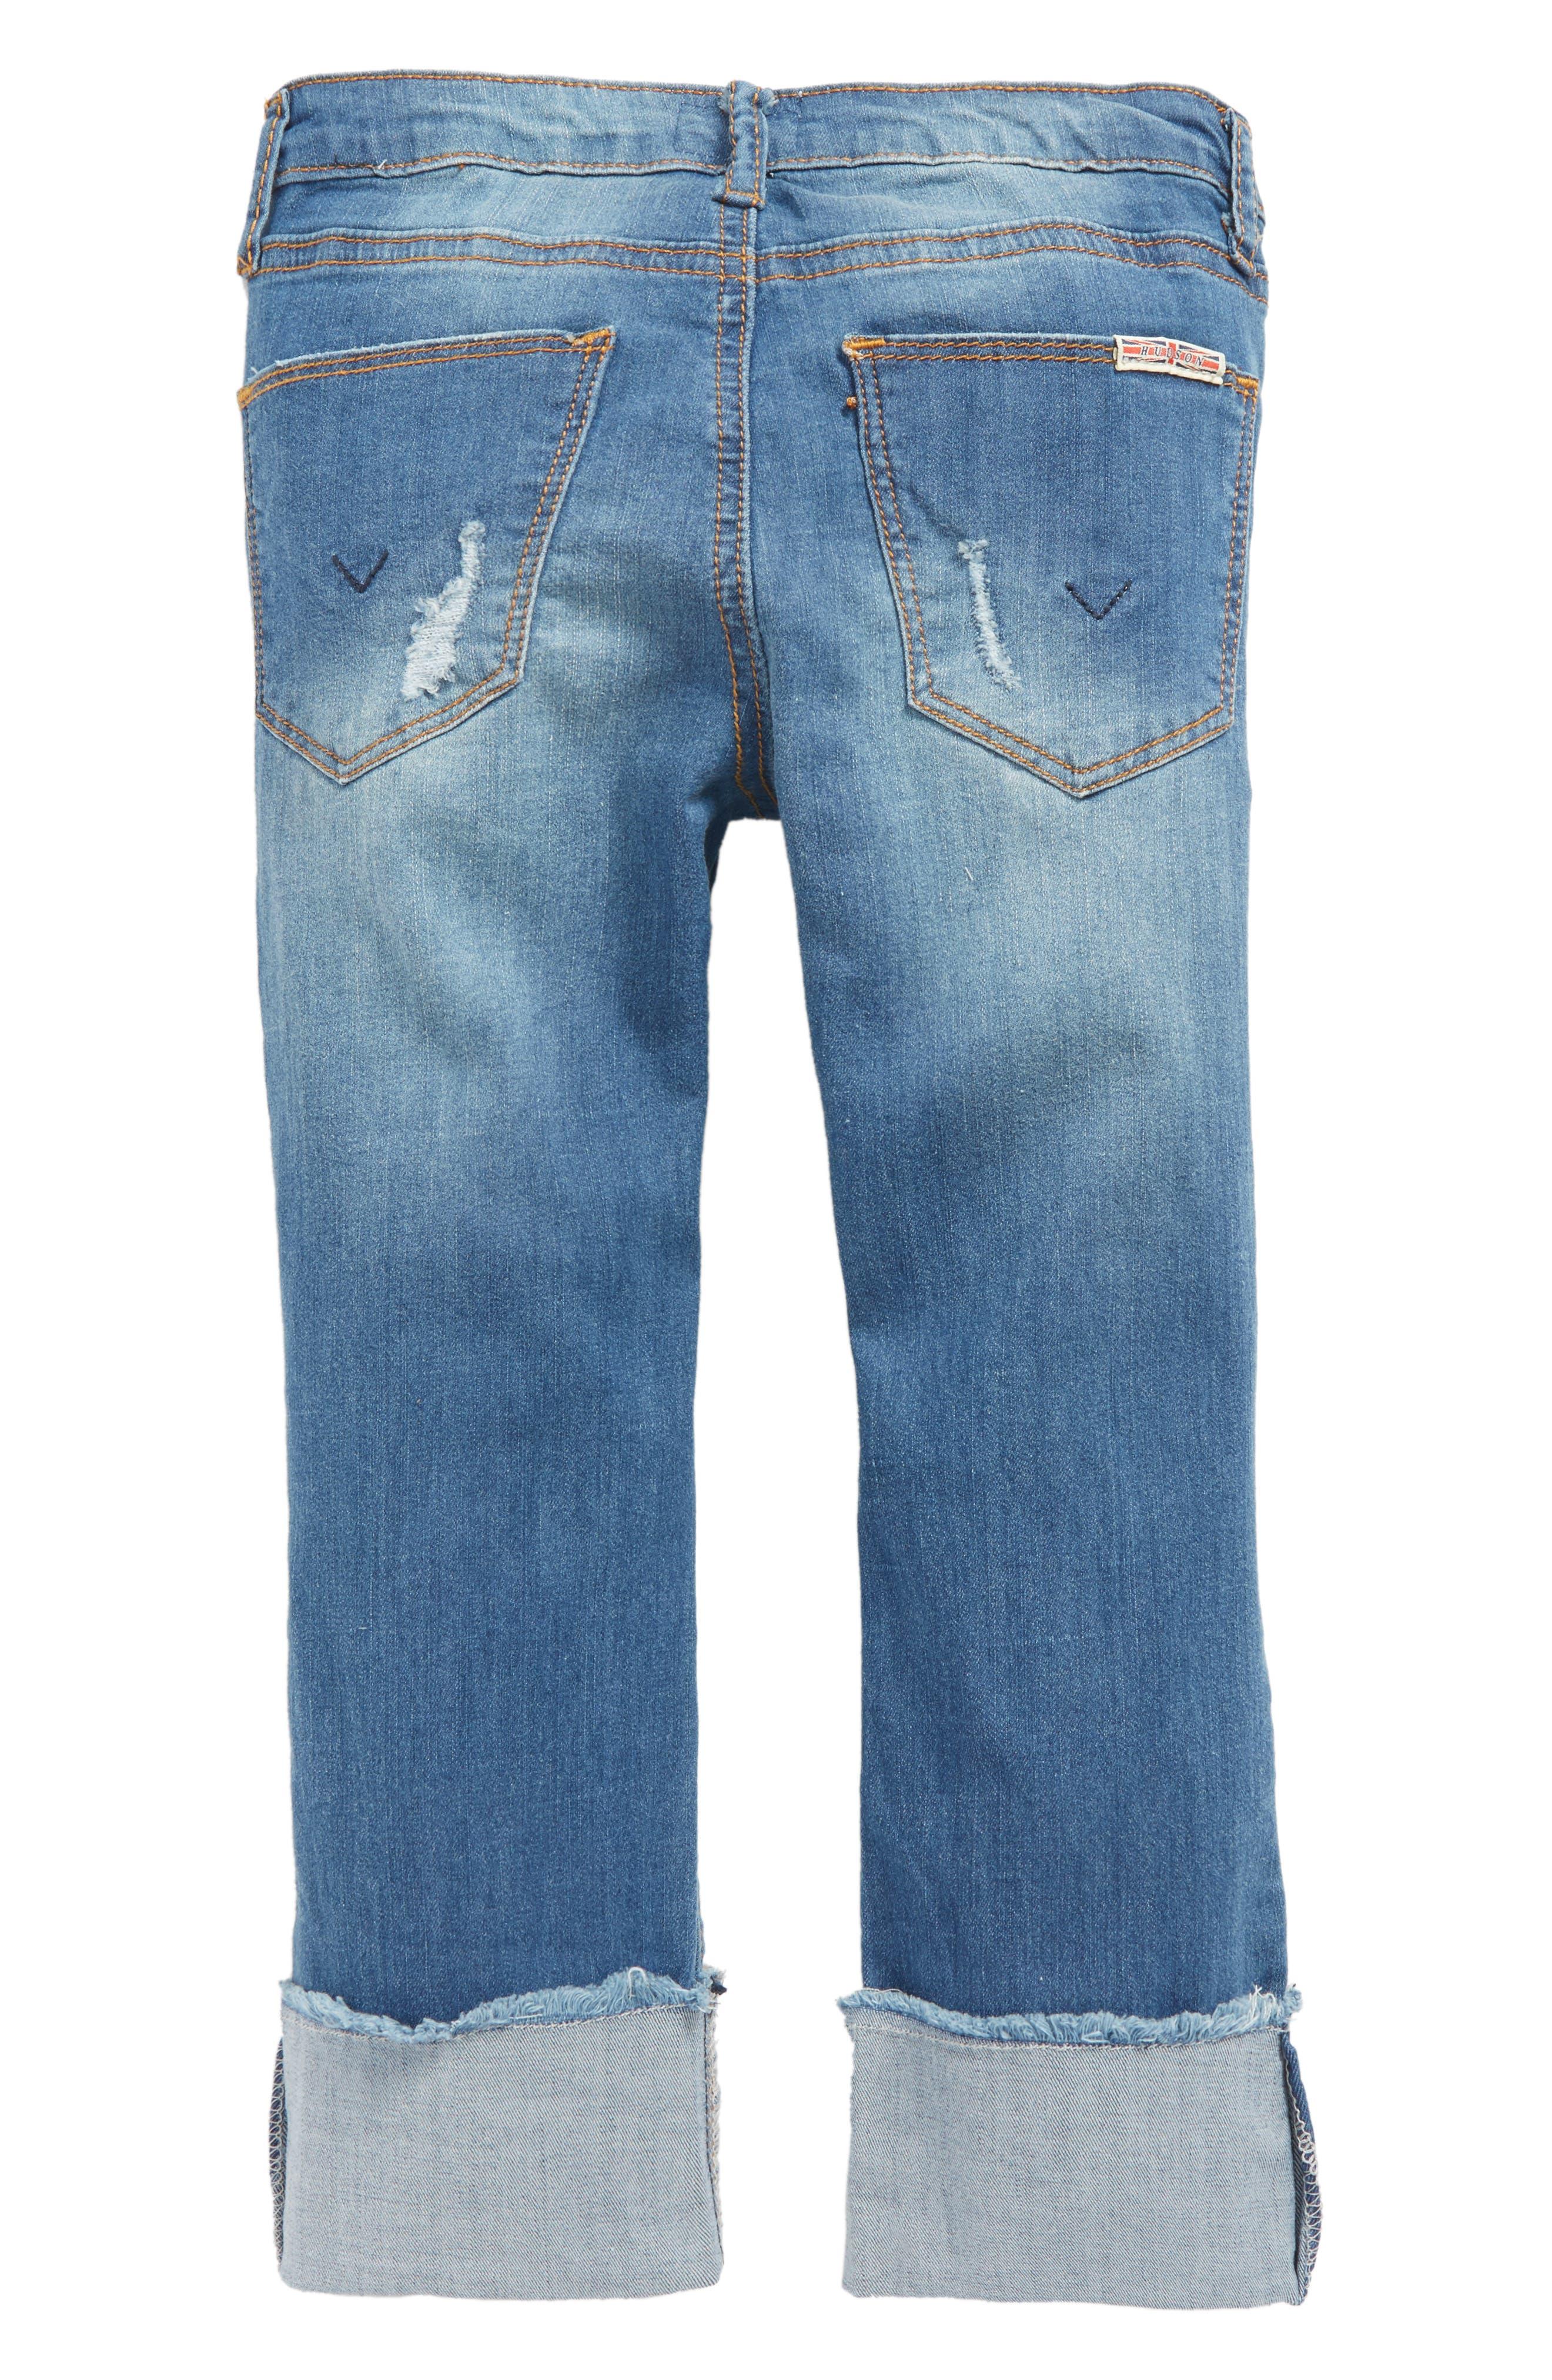 Jessa Crop Skinny Jeans,                             Alternate thumbnail 2, color,                             499